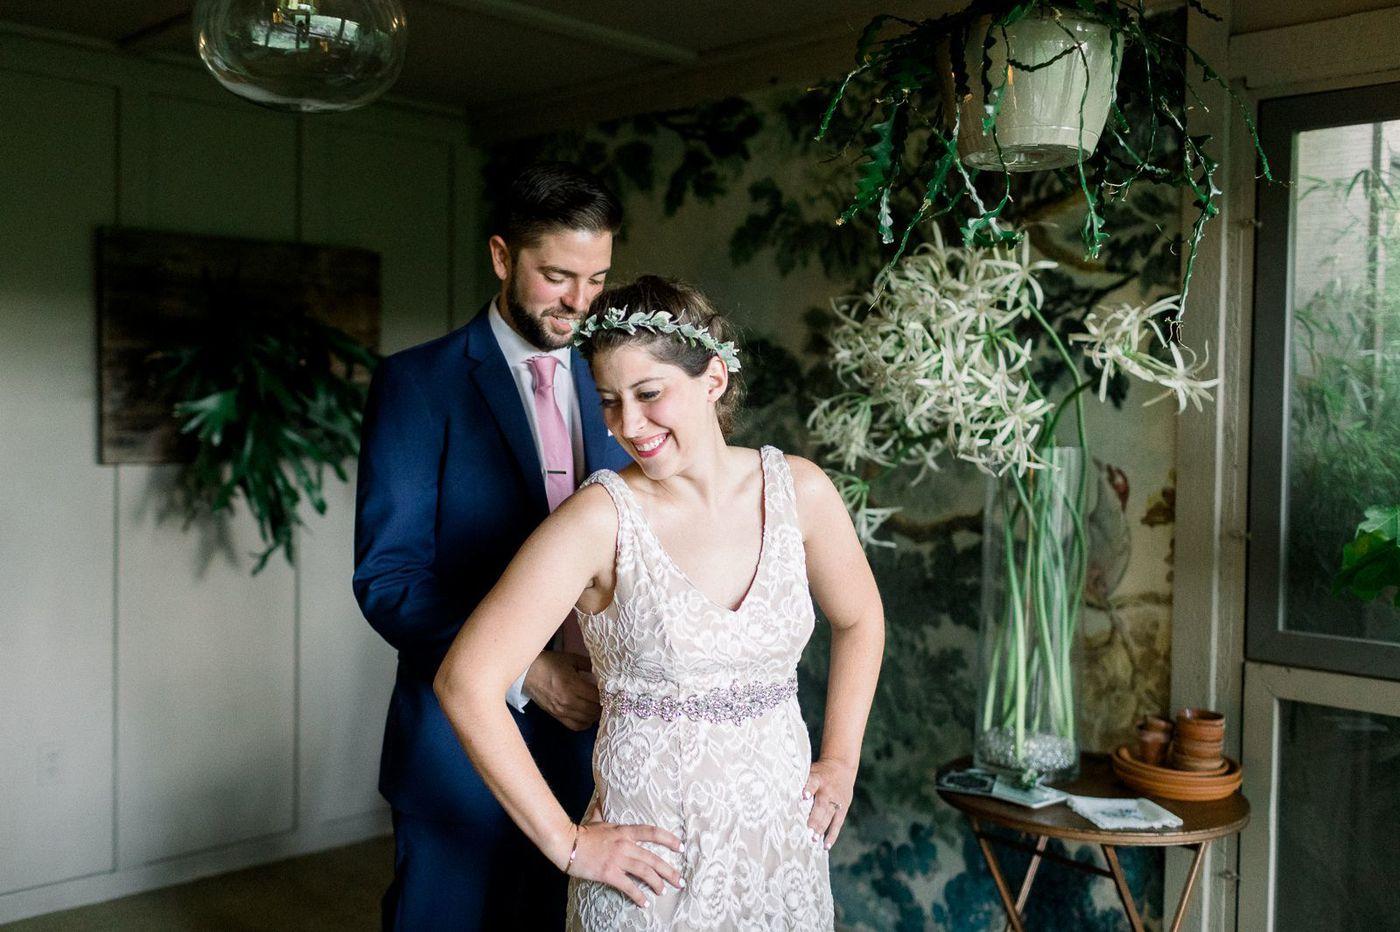 Philadelphia weddings: Ashley Hallowell and Josh Scarbriel